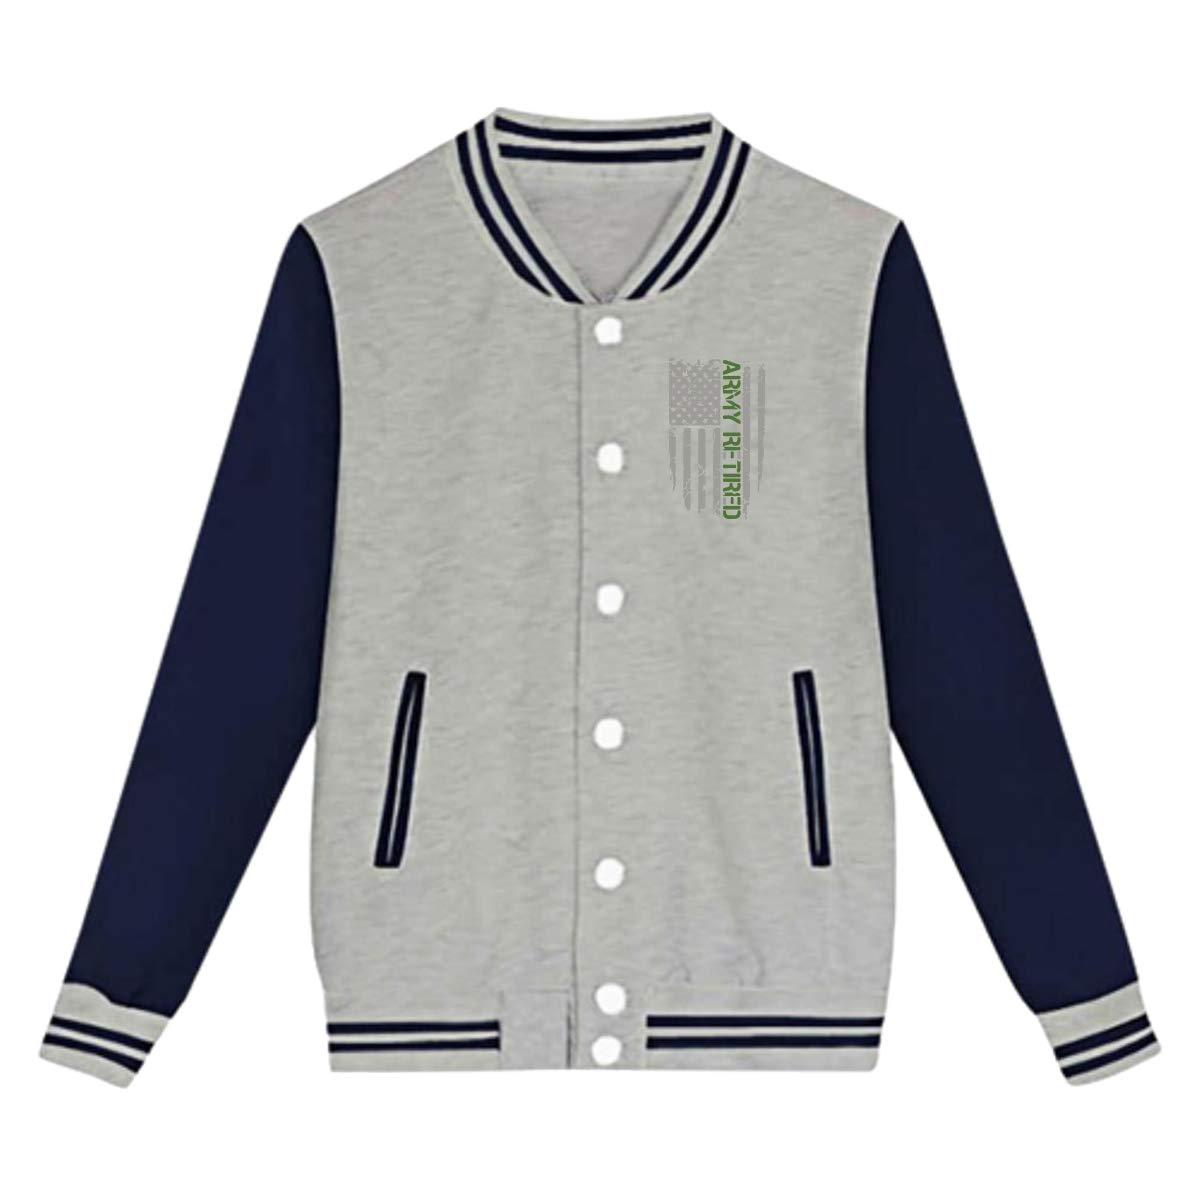 Tina TN Army Retired Flag Teens Boys Girl Varsity Baseball Jacket Long Sleeve Sport Baseball Uniform Jacket Coat Sweater Black